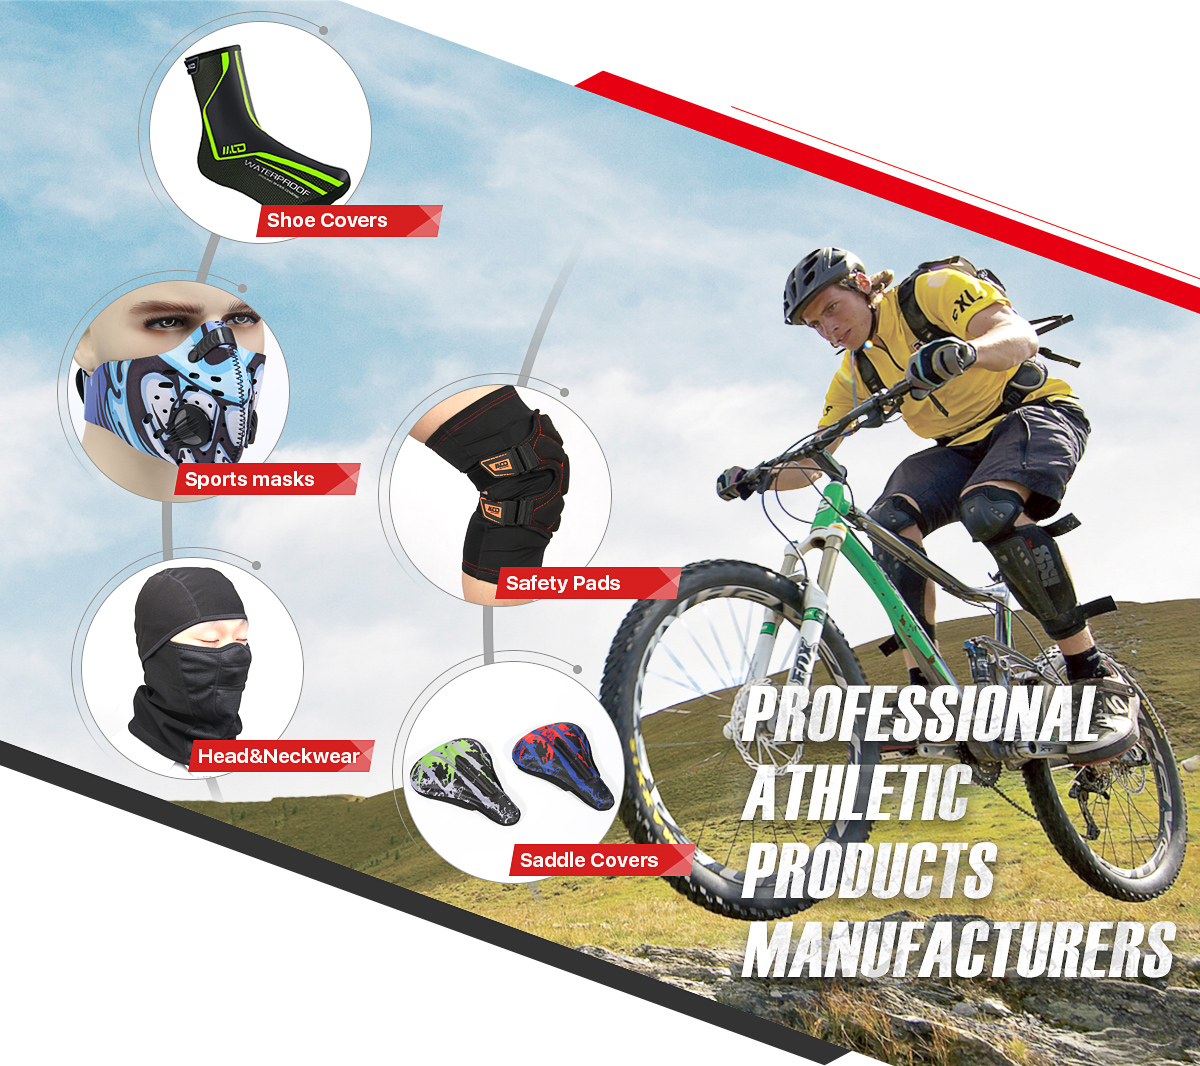 Zhongshan Mld Sporting Goods Co Ltd Wrist Wraps Knee Brace Masker Polar 6 In 1 Premium Quality